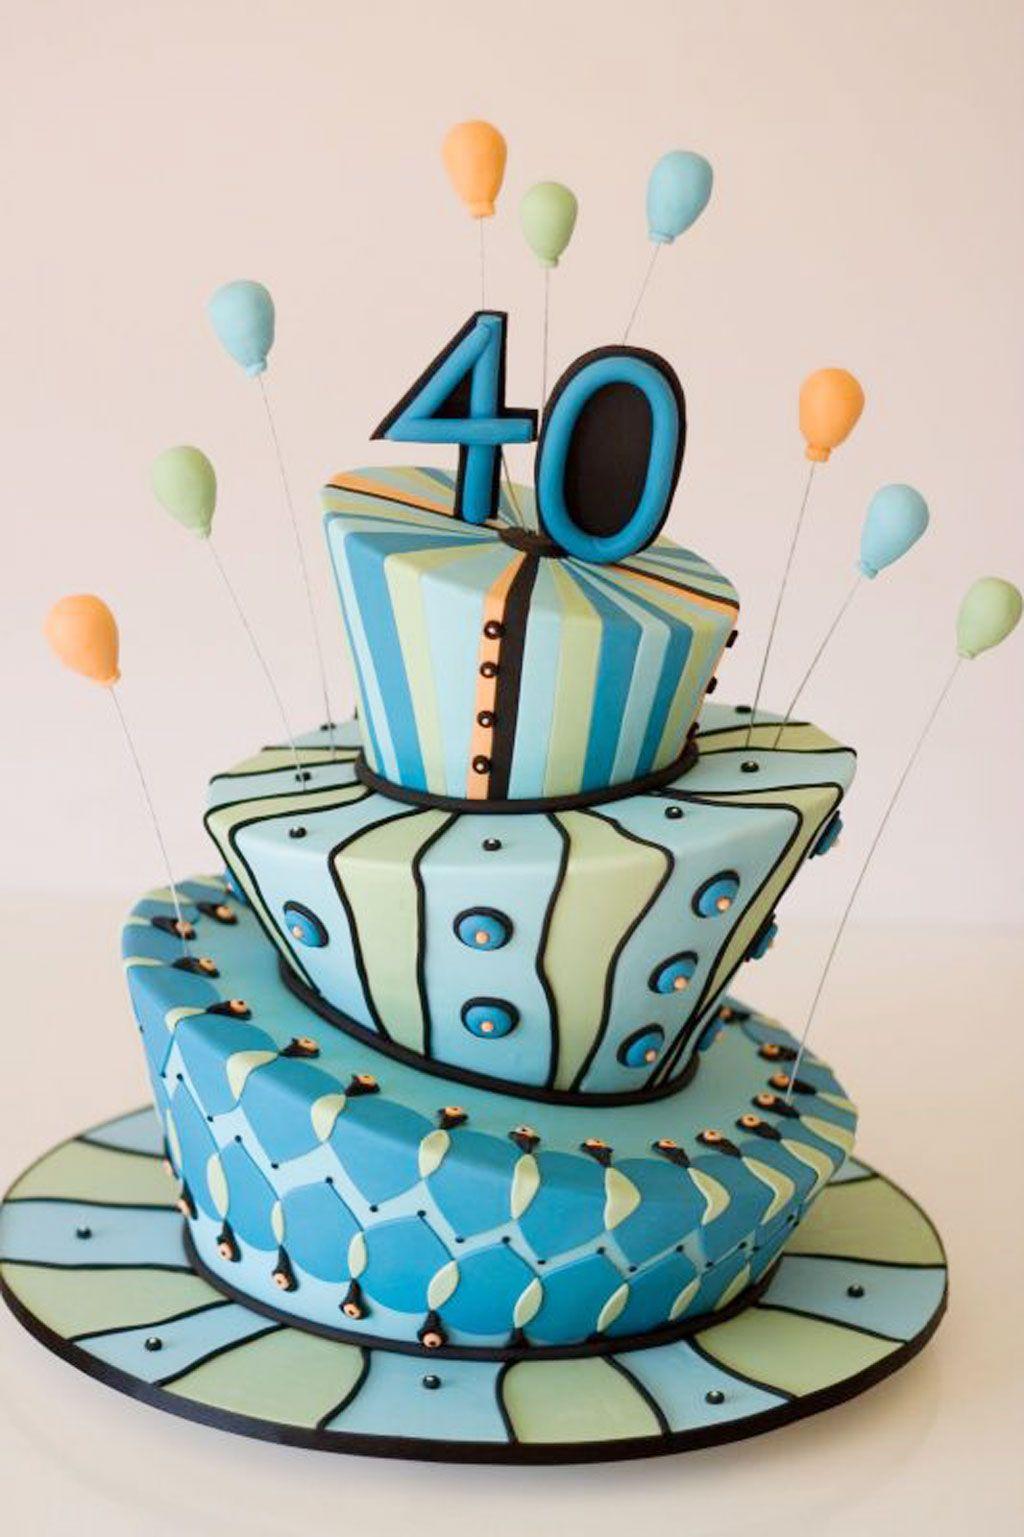 40th Birthday Cake Decorating Ideas 40th Birthday Cakes Birthday Cakes For Men 40th Birthday Cakes For Men